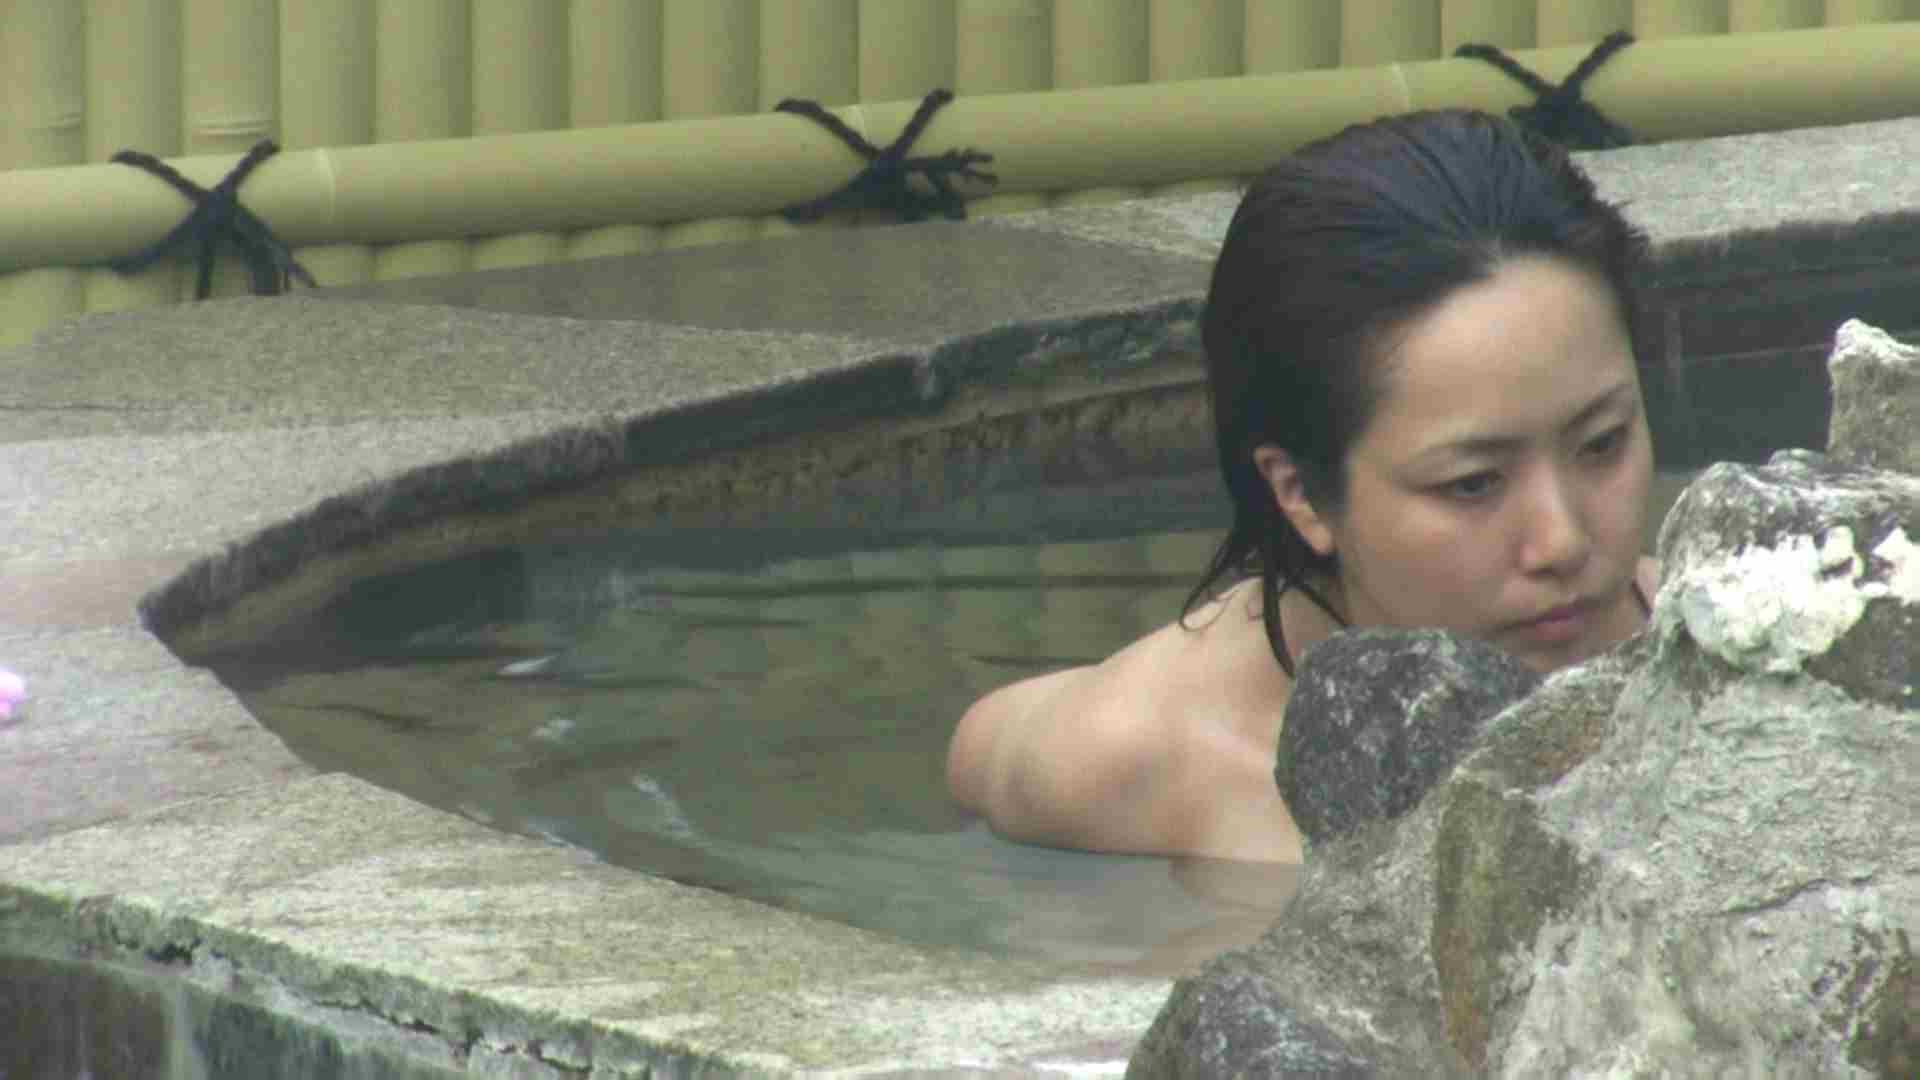 Aquaな露天風呂Vol.604 OLのエロ生活 オメコ動画キャプチャ 84連発 32